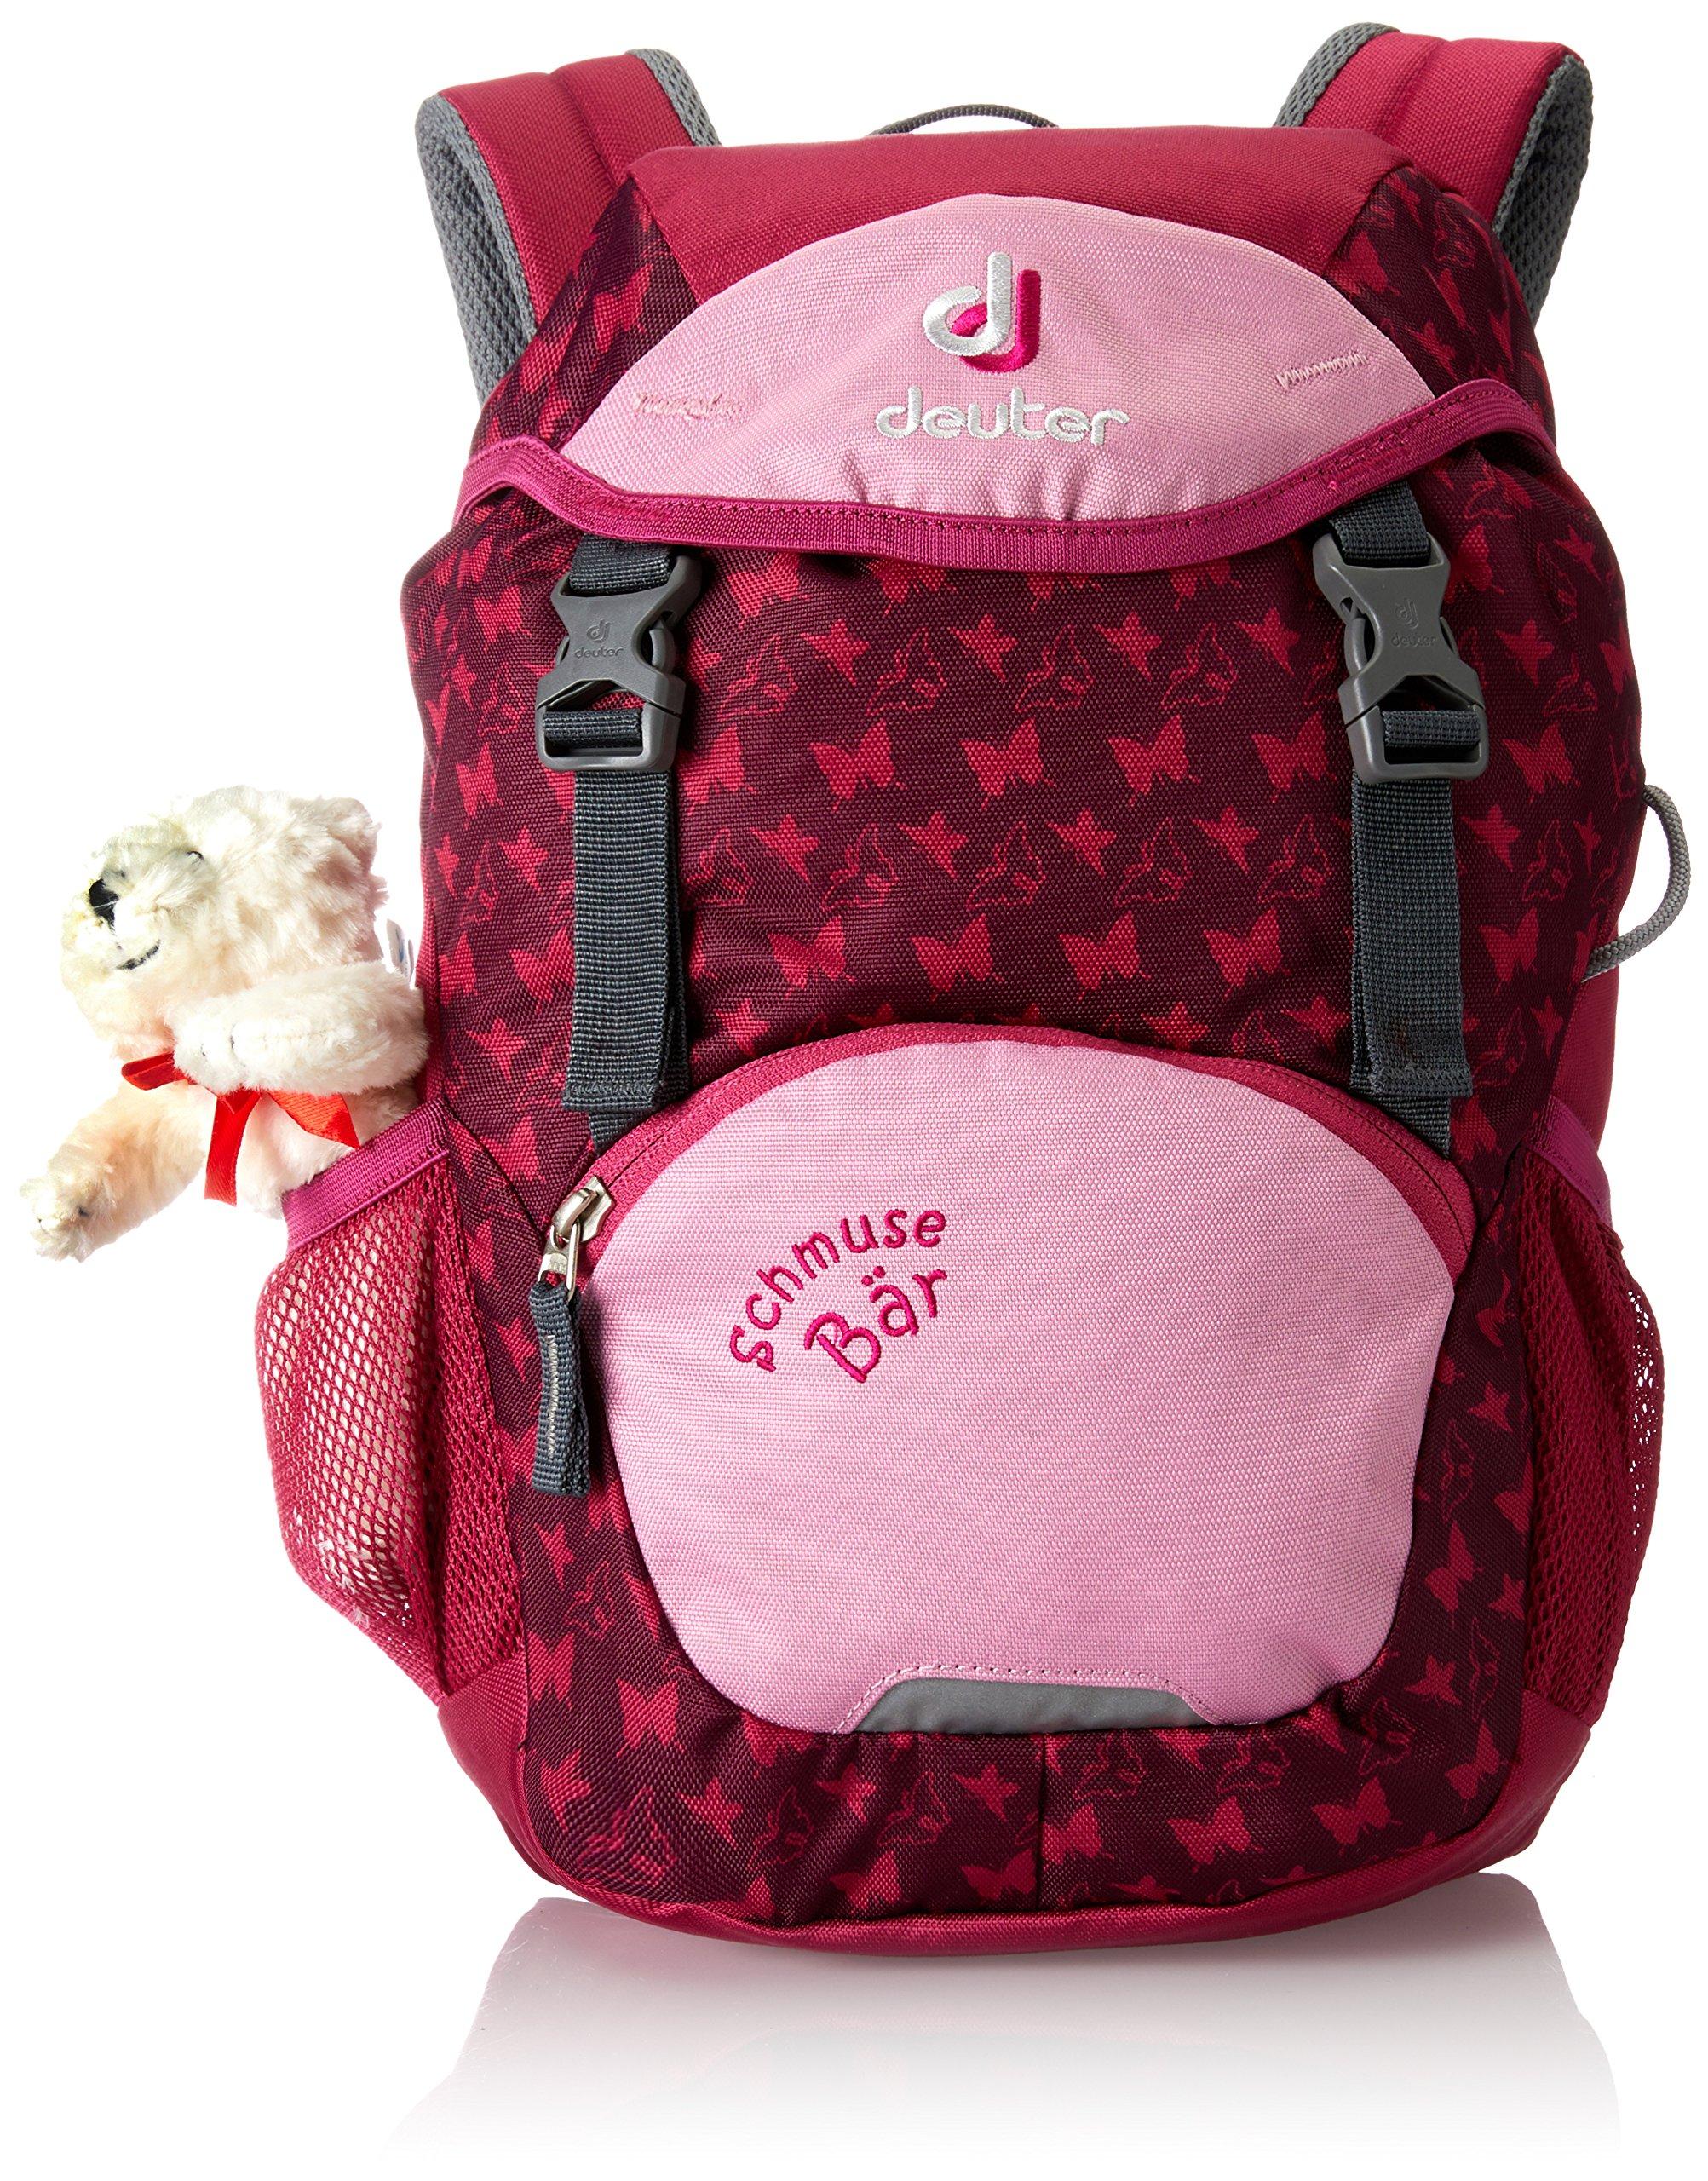 Deuter Schmusebar Kid's Backpack, Magenta